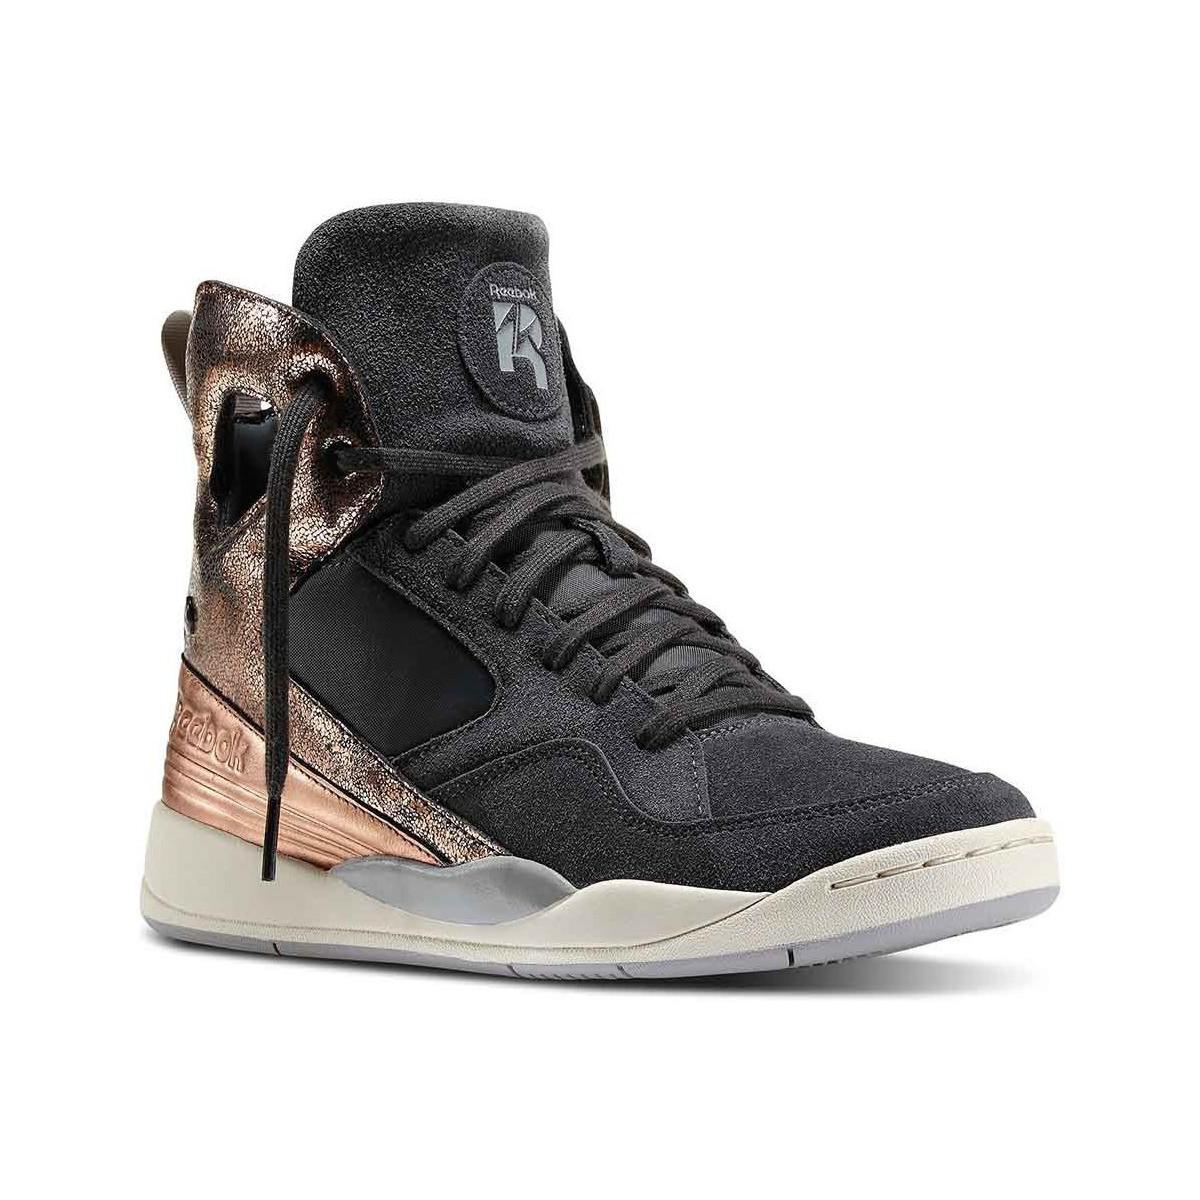 Reebok Akeys Court Women's Shoes (high-top Trainers) In Gold in Metallic